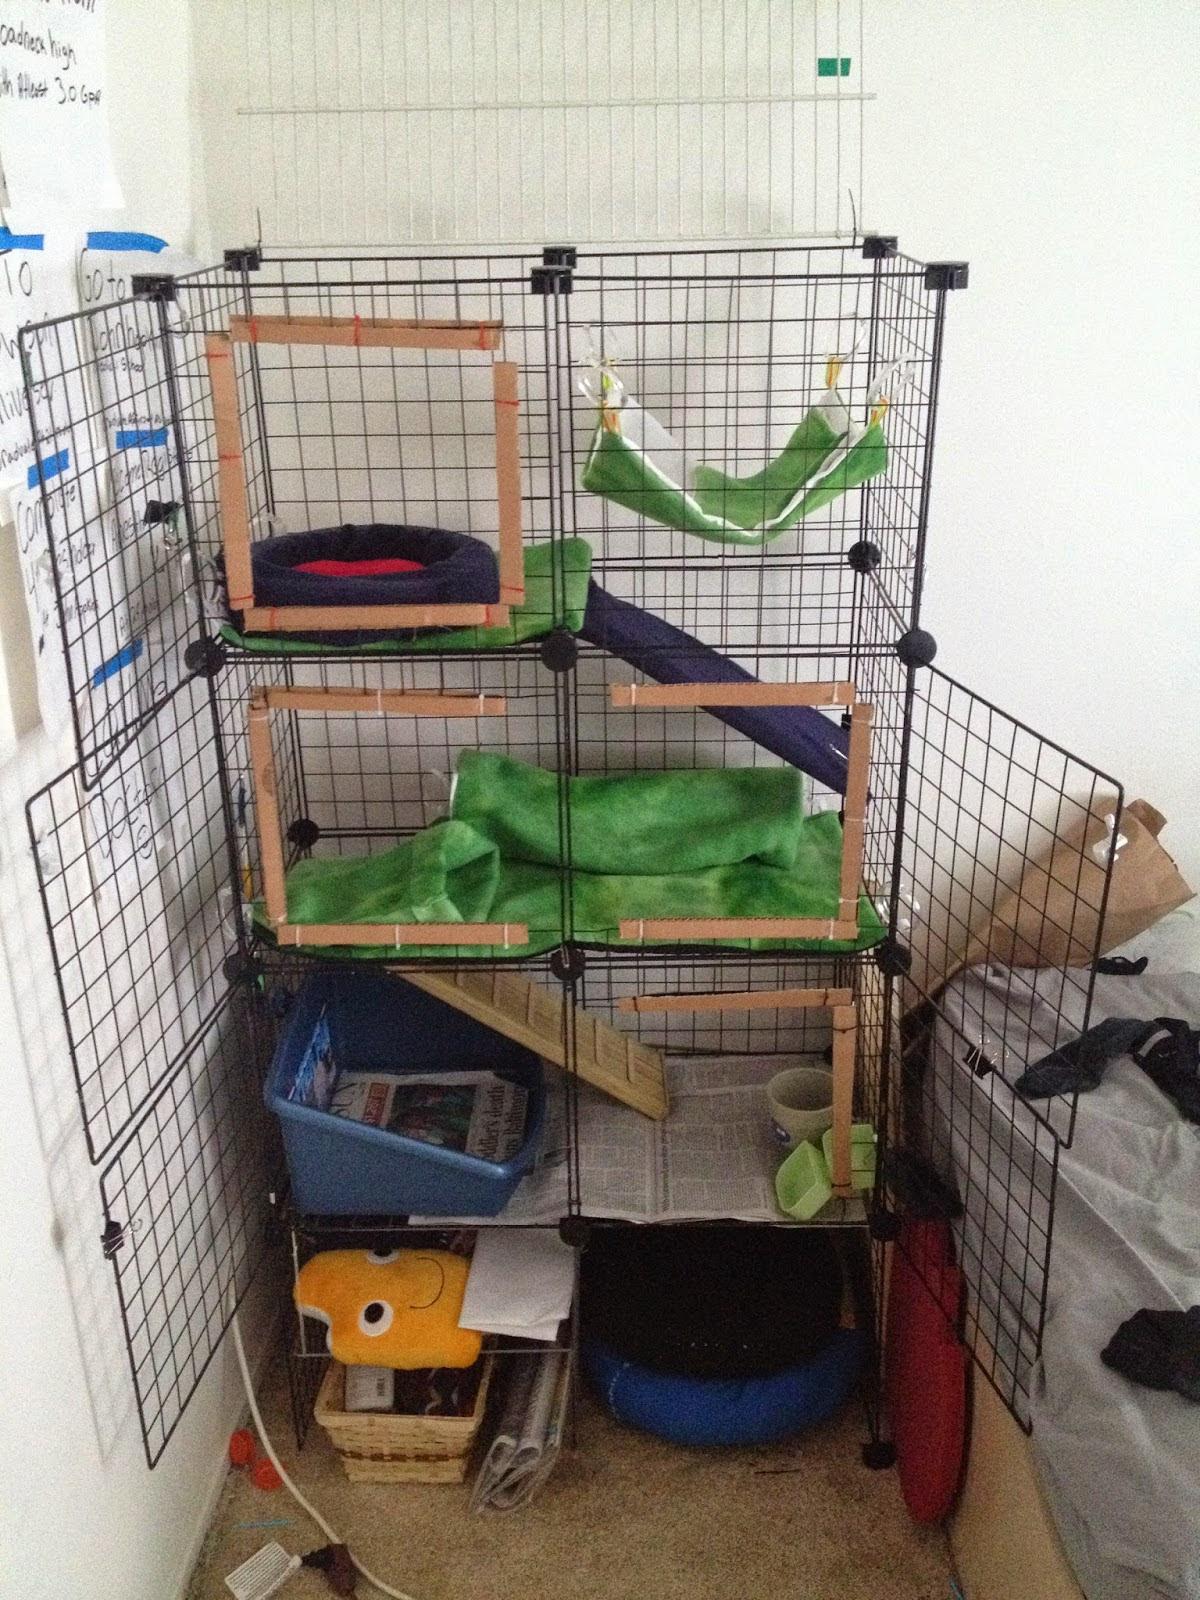 Diy Ferret Cage Toys - Clublifeglobal.com